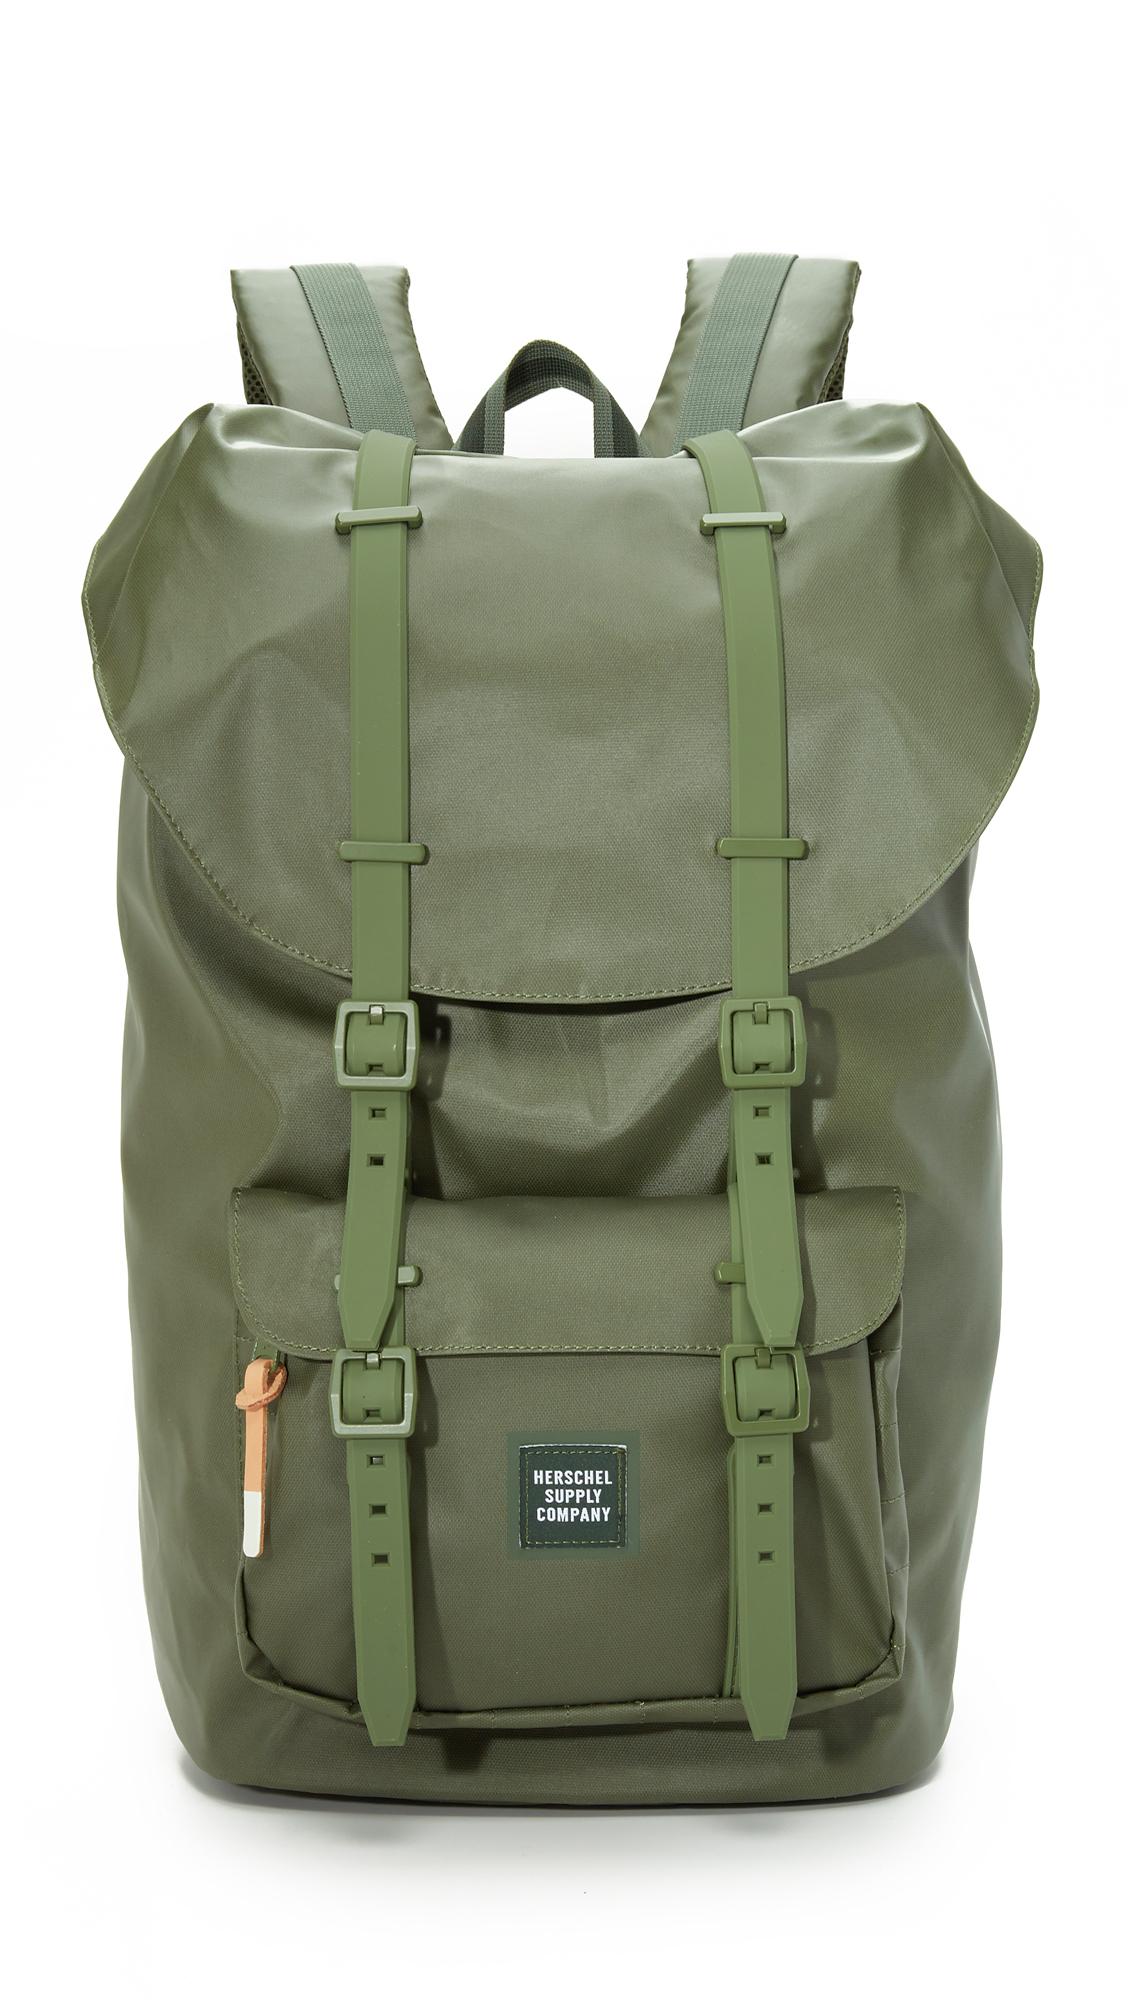 3667ad1c365 Lyst - Herschel Supply Co. Studio Little America Backpack in Green ...